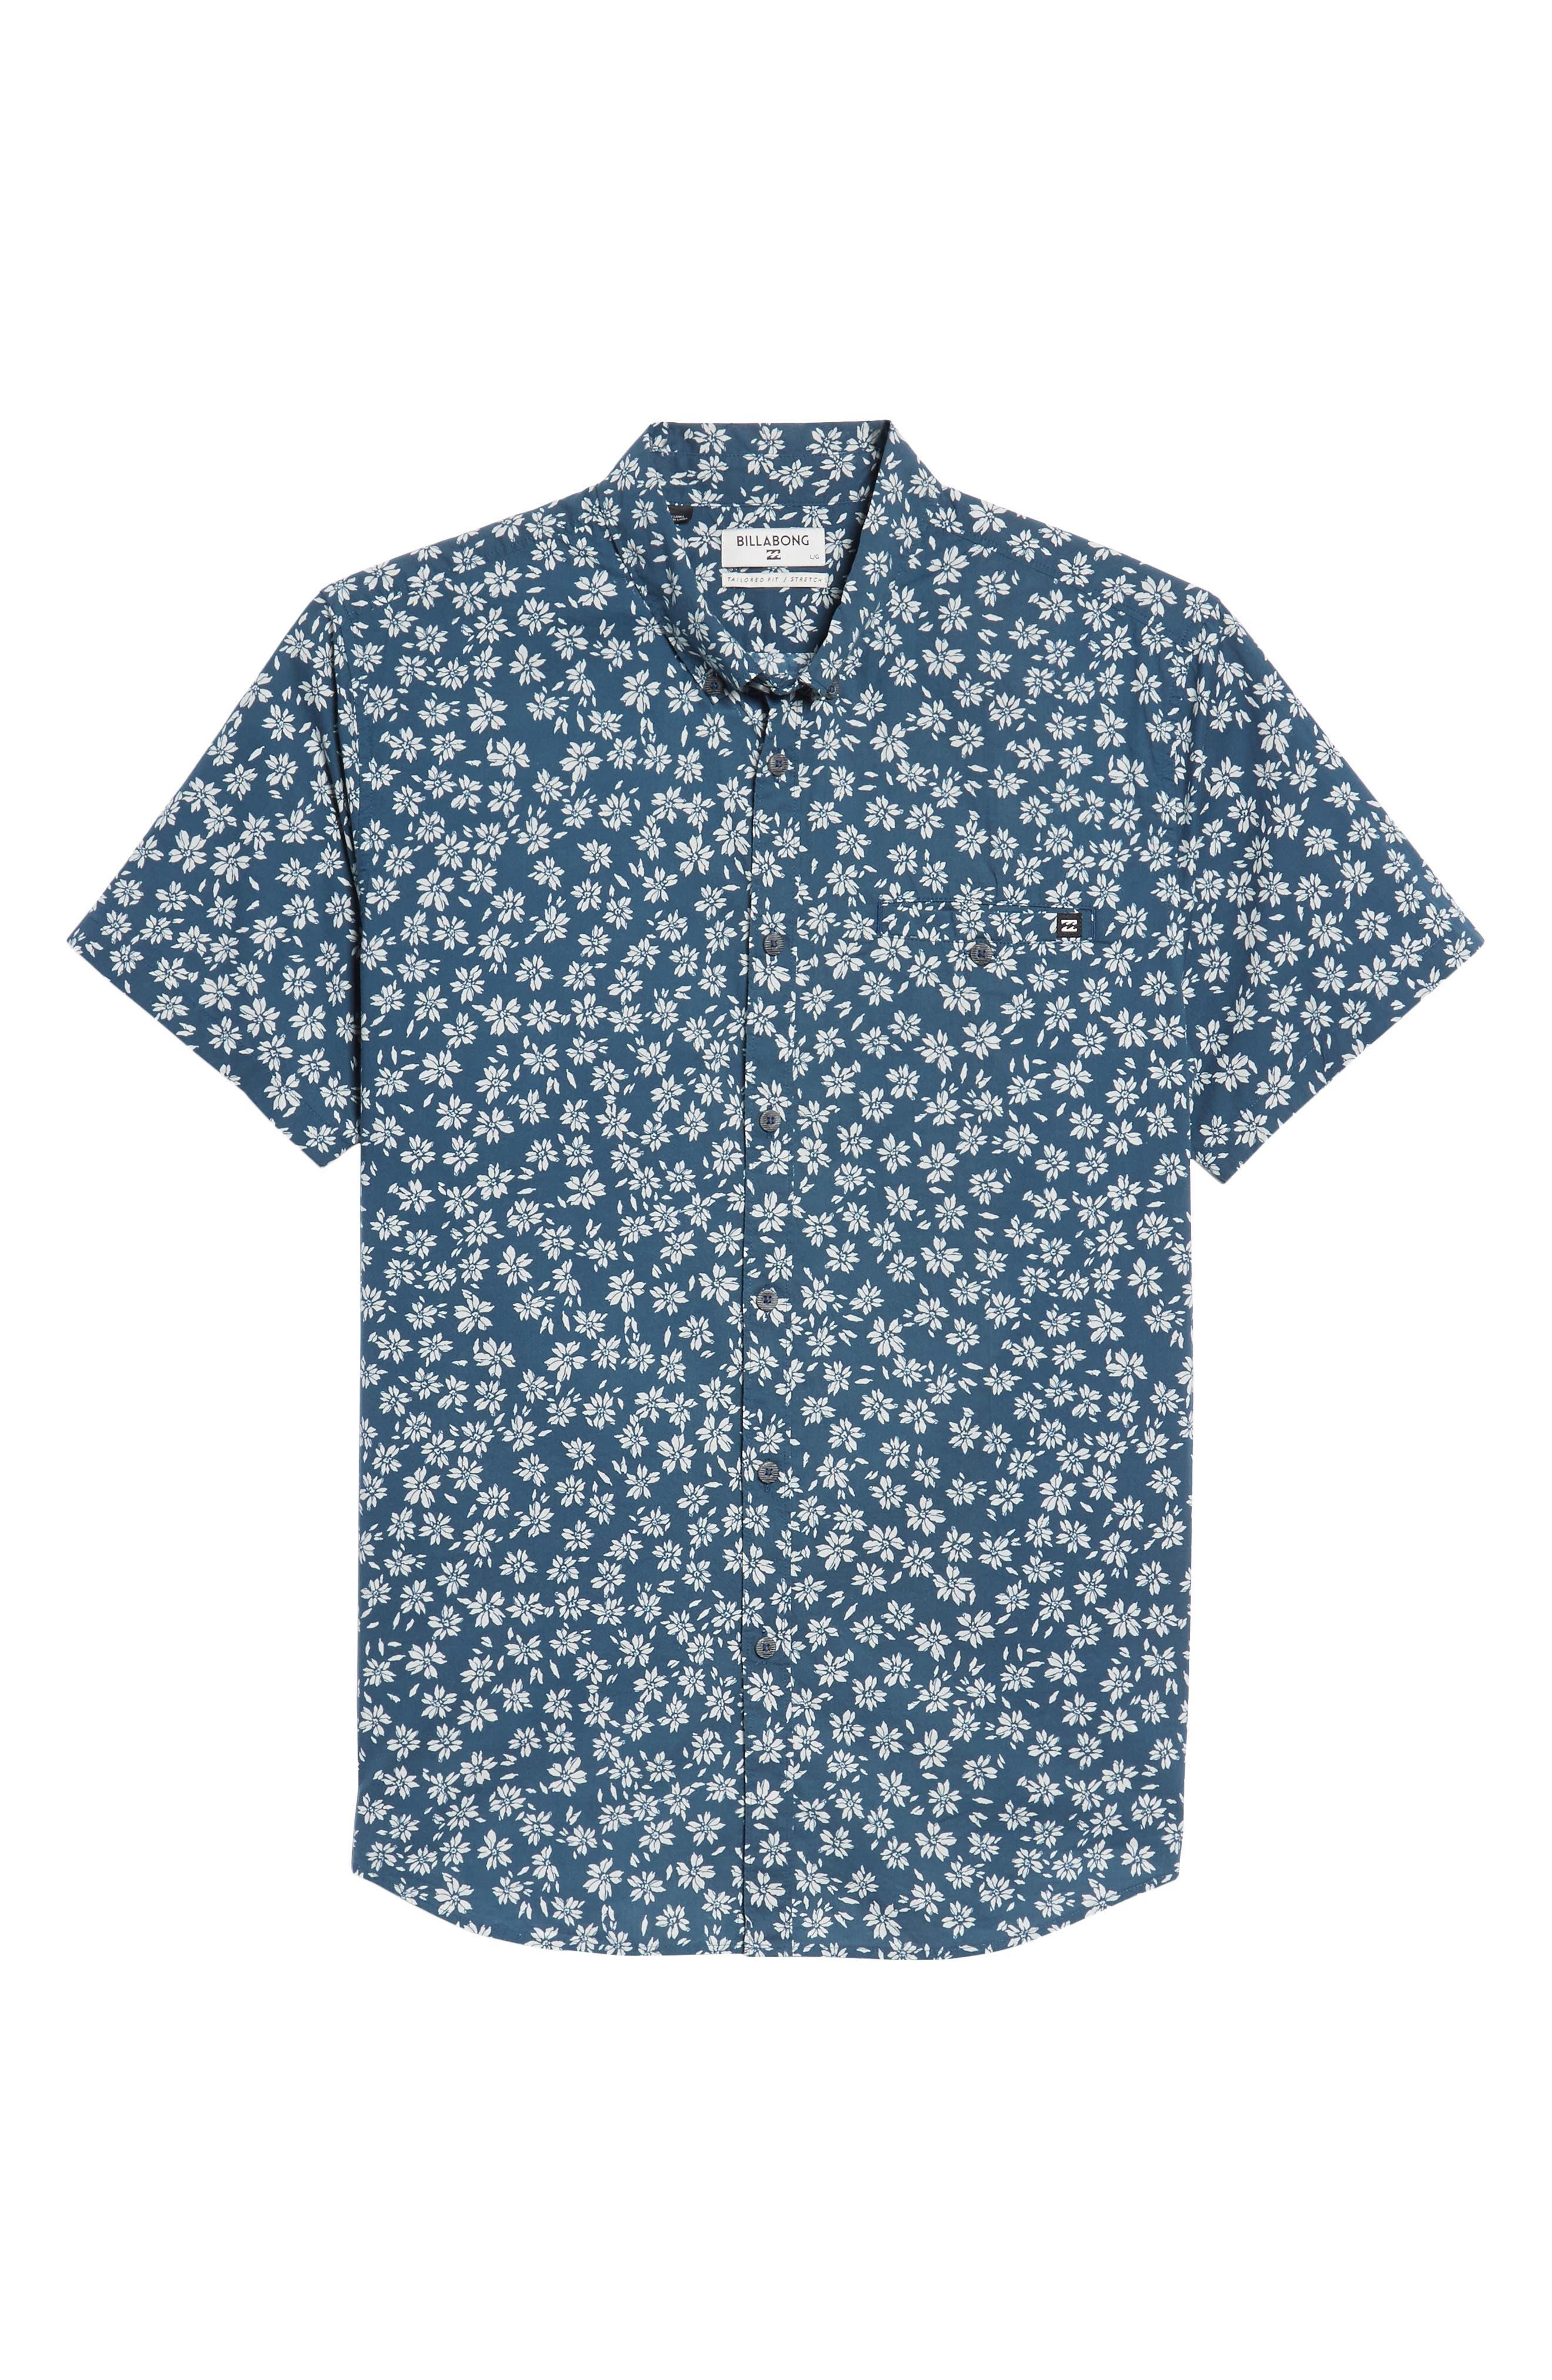 Sunday Woven Shirt,                             Alternate thumbnail 24, color,